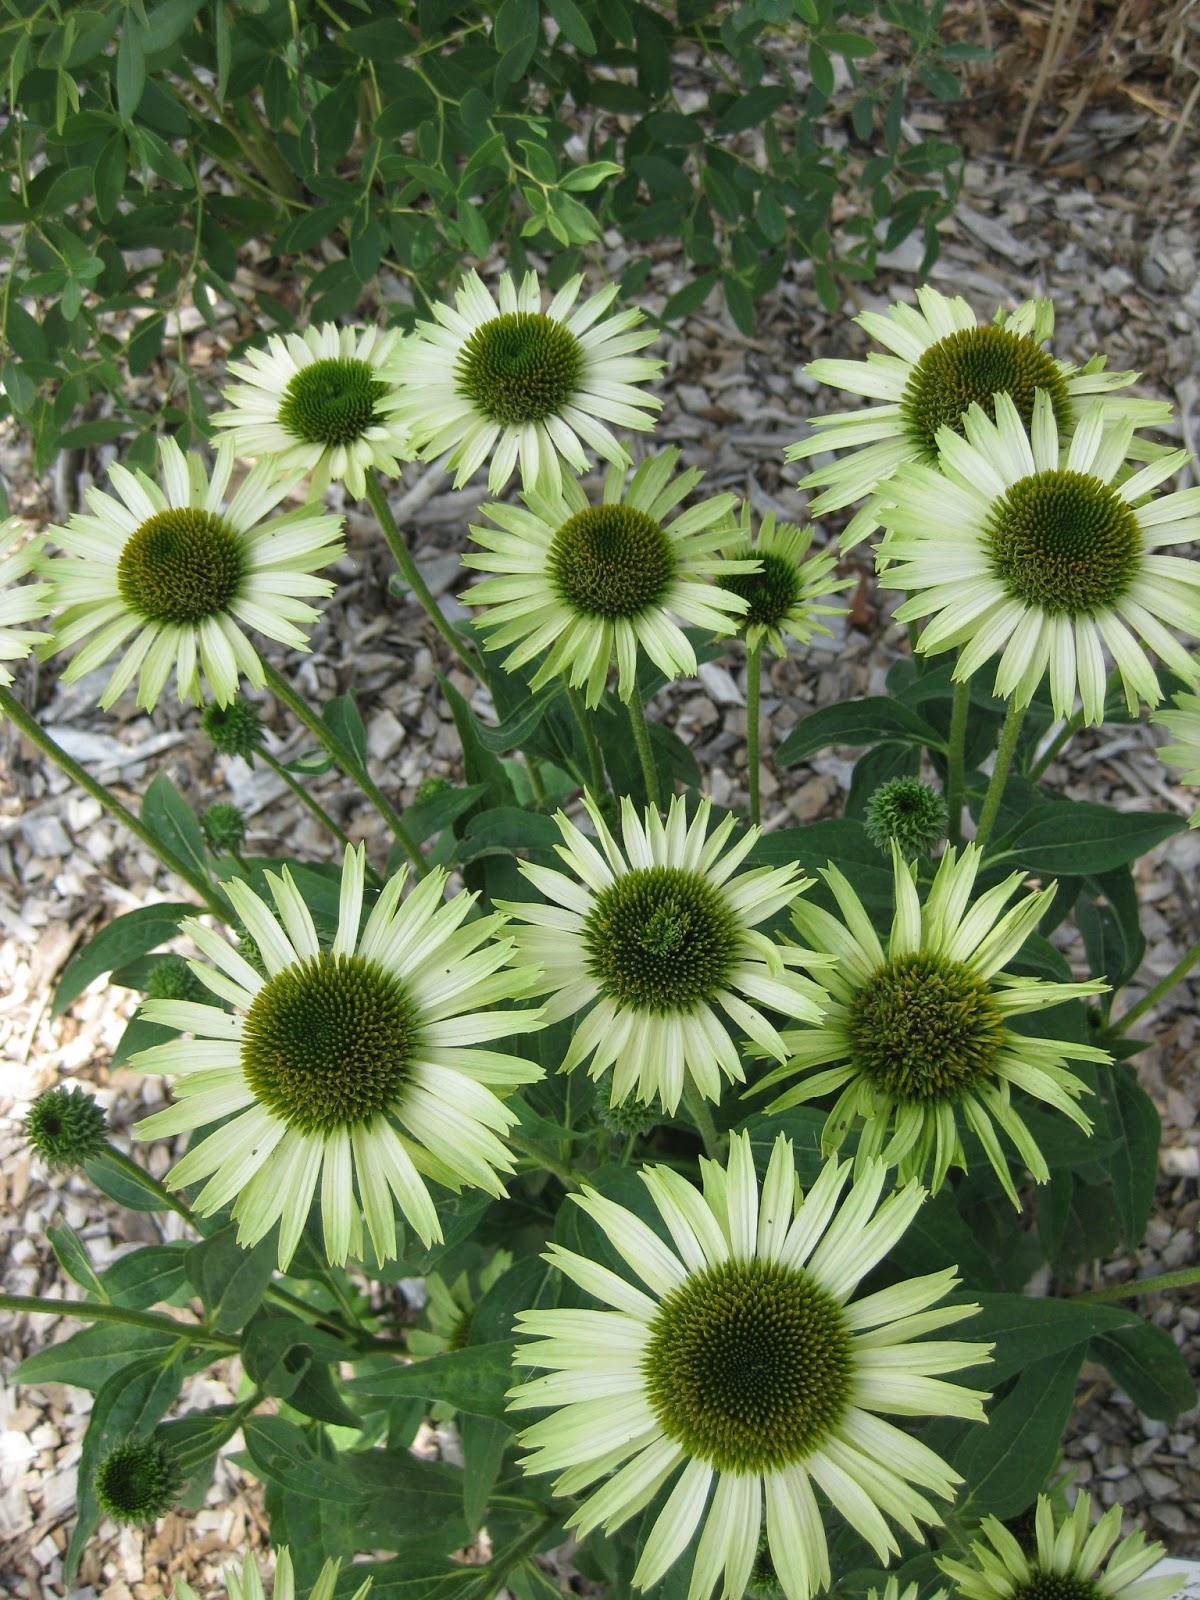 rotary botanical gardens hort blog a sun tribute. Black Bedroom Furniture Sets. Home Design Ideas